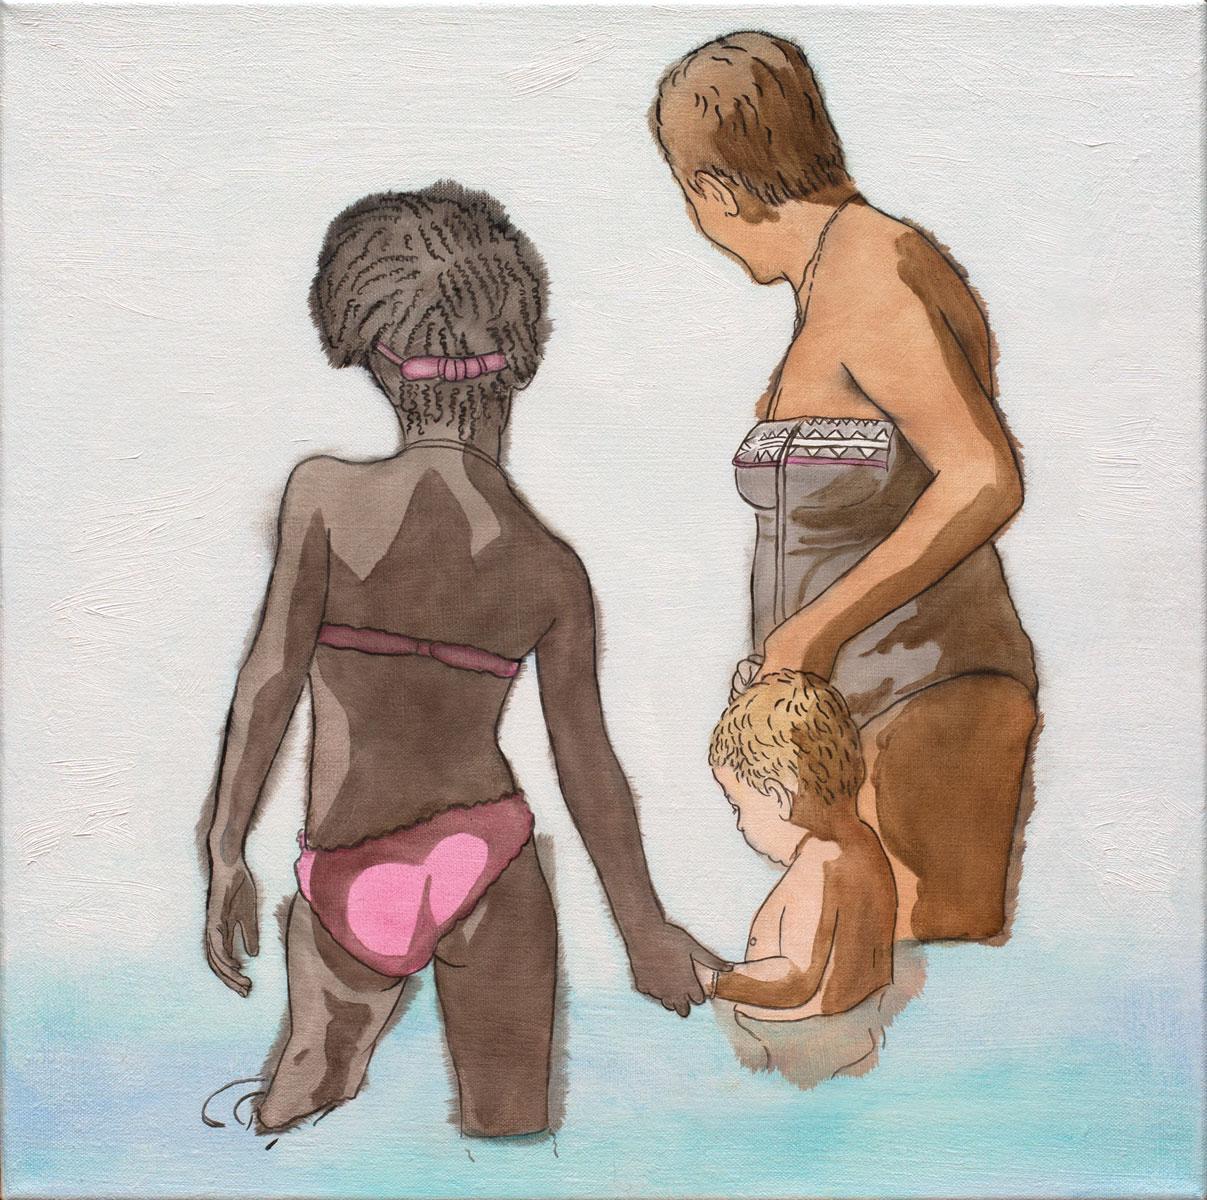 beach-trio-malayka-gormally.jpg